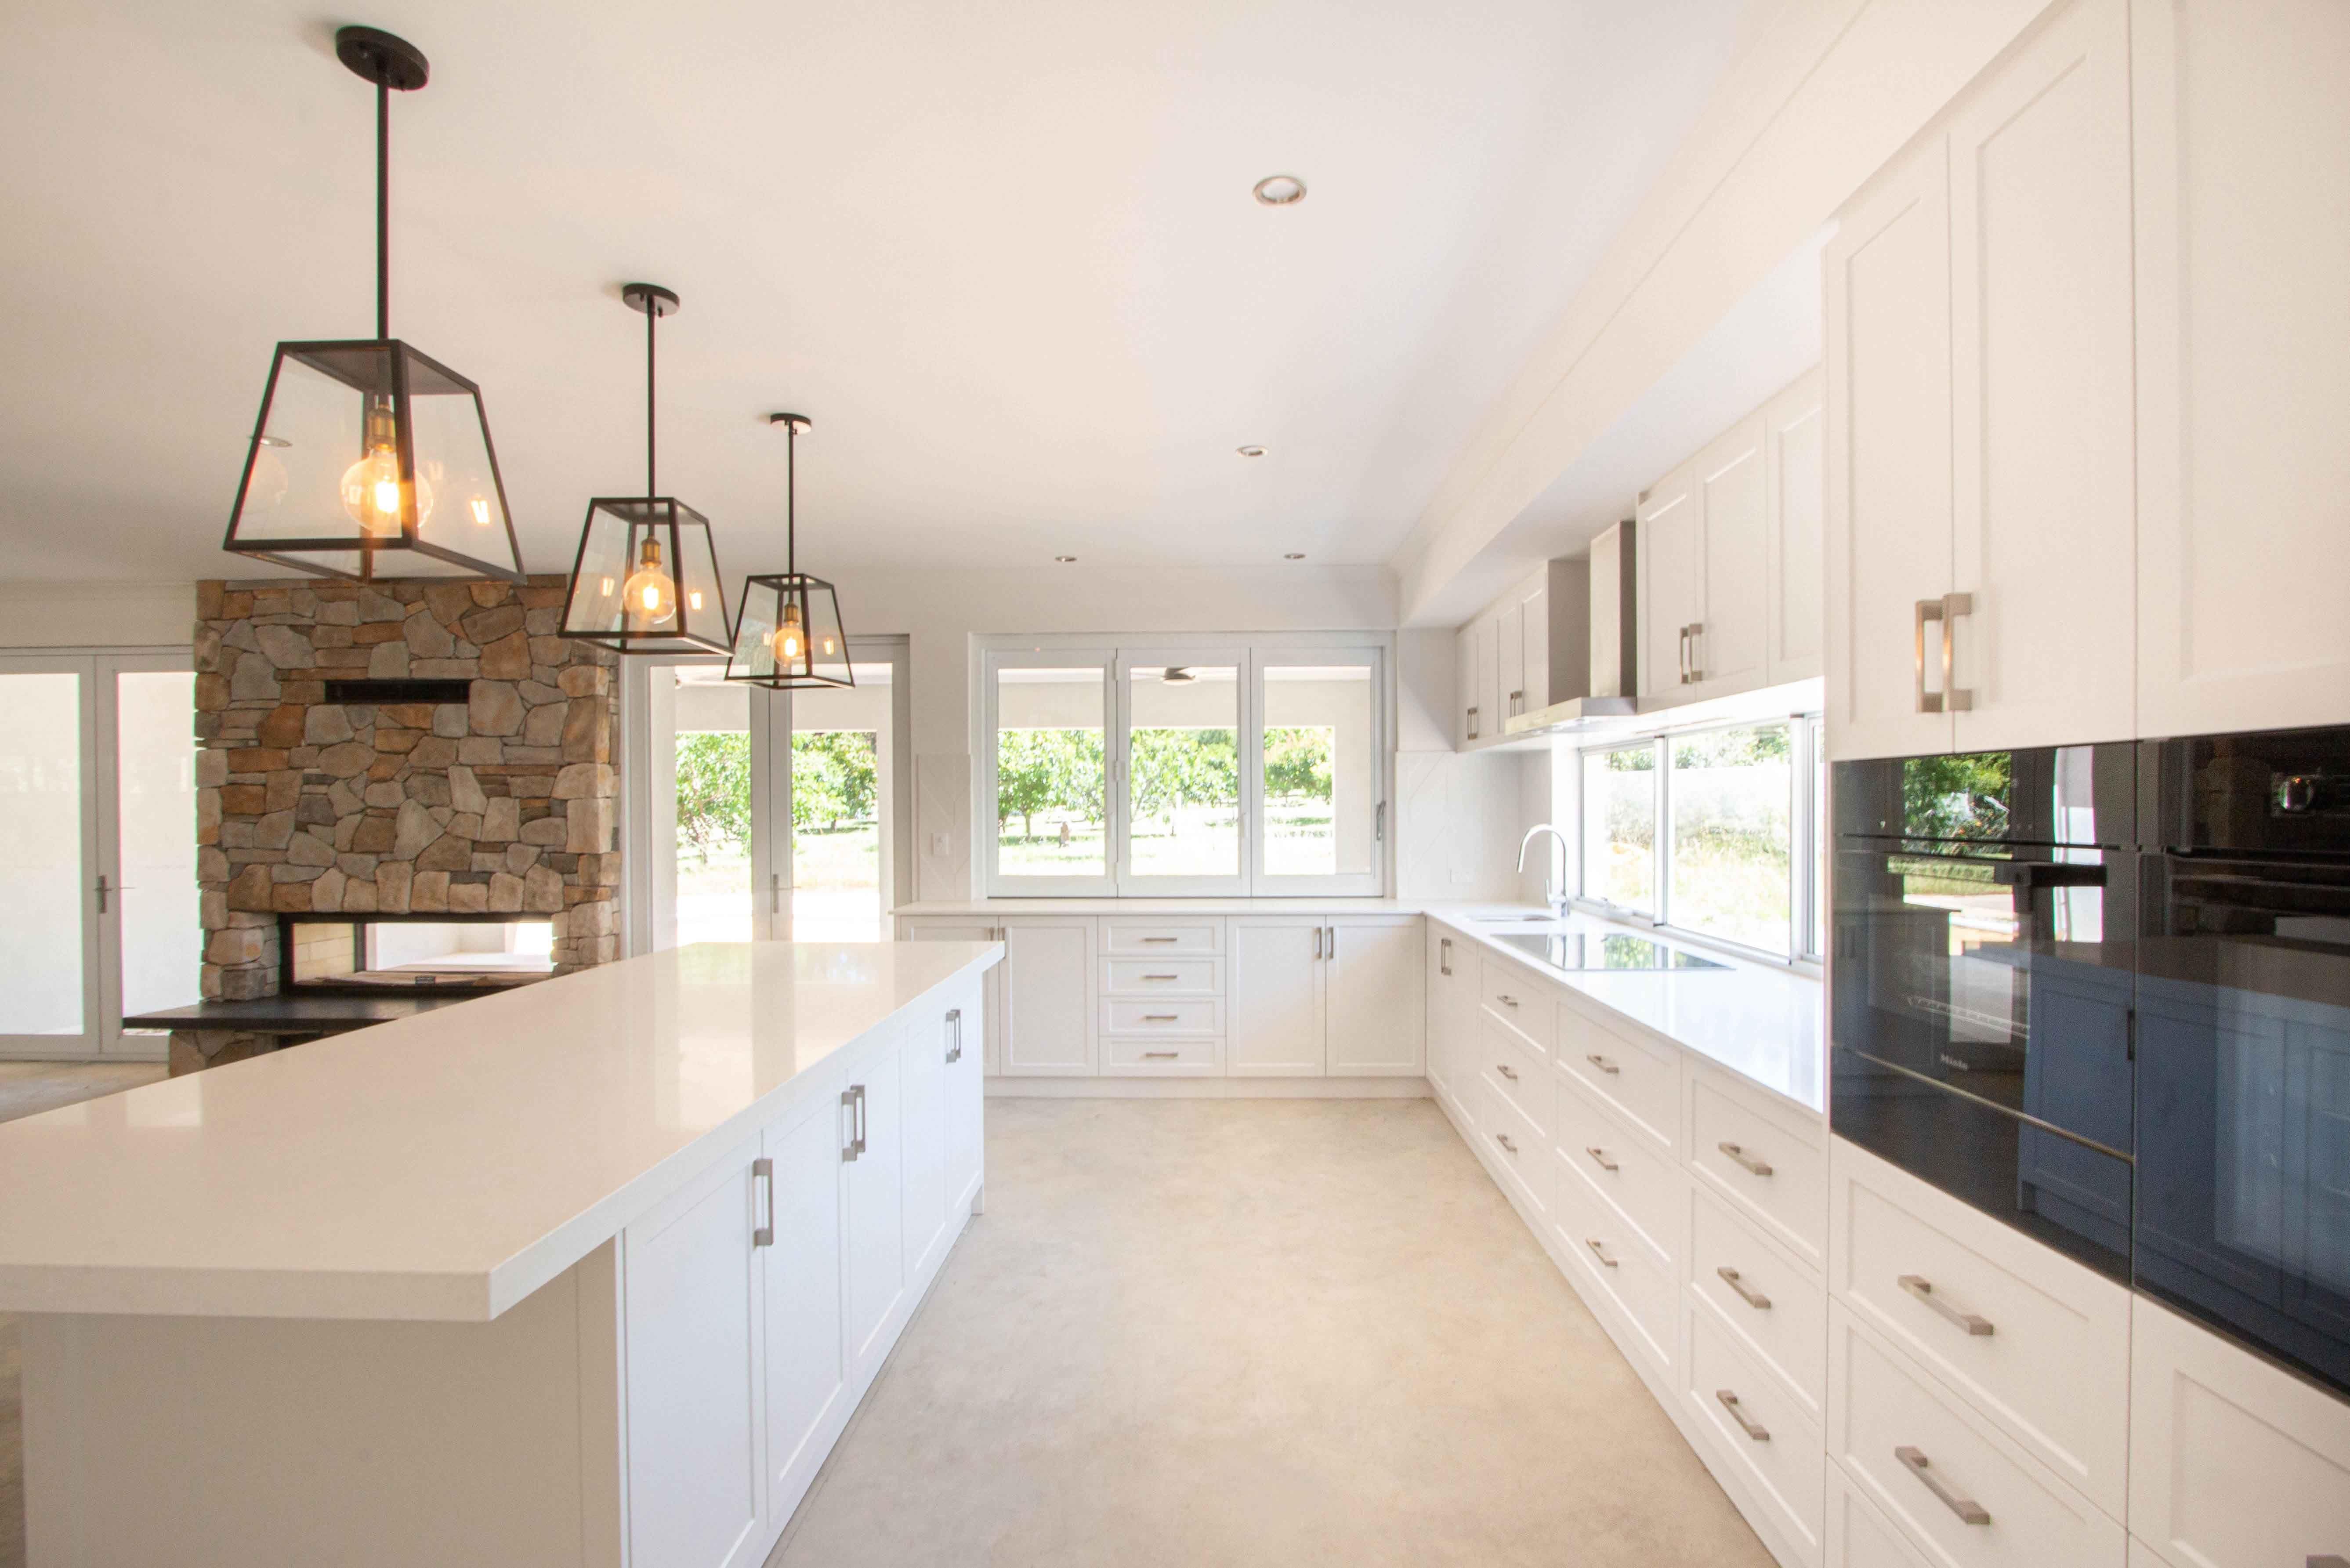 #ruralliving #qualitybuildersperth #countryhome #Perth #perthbuilder #kitchen